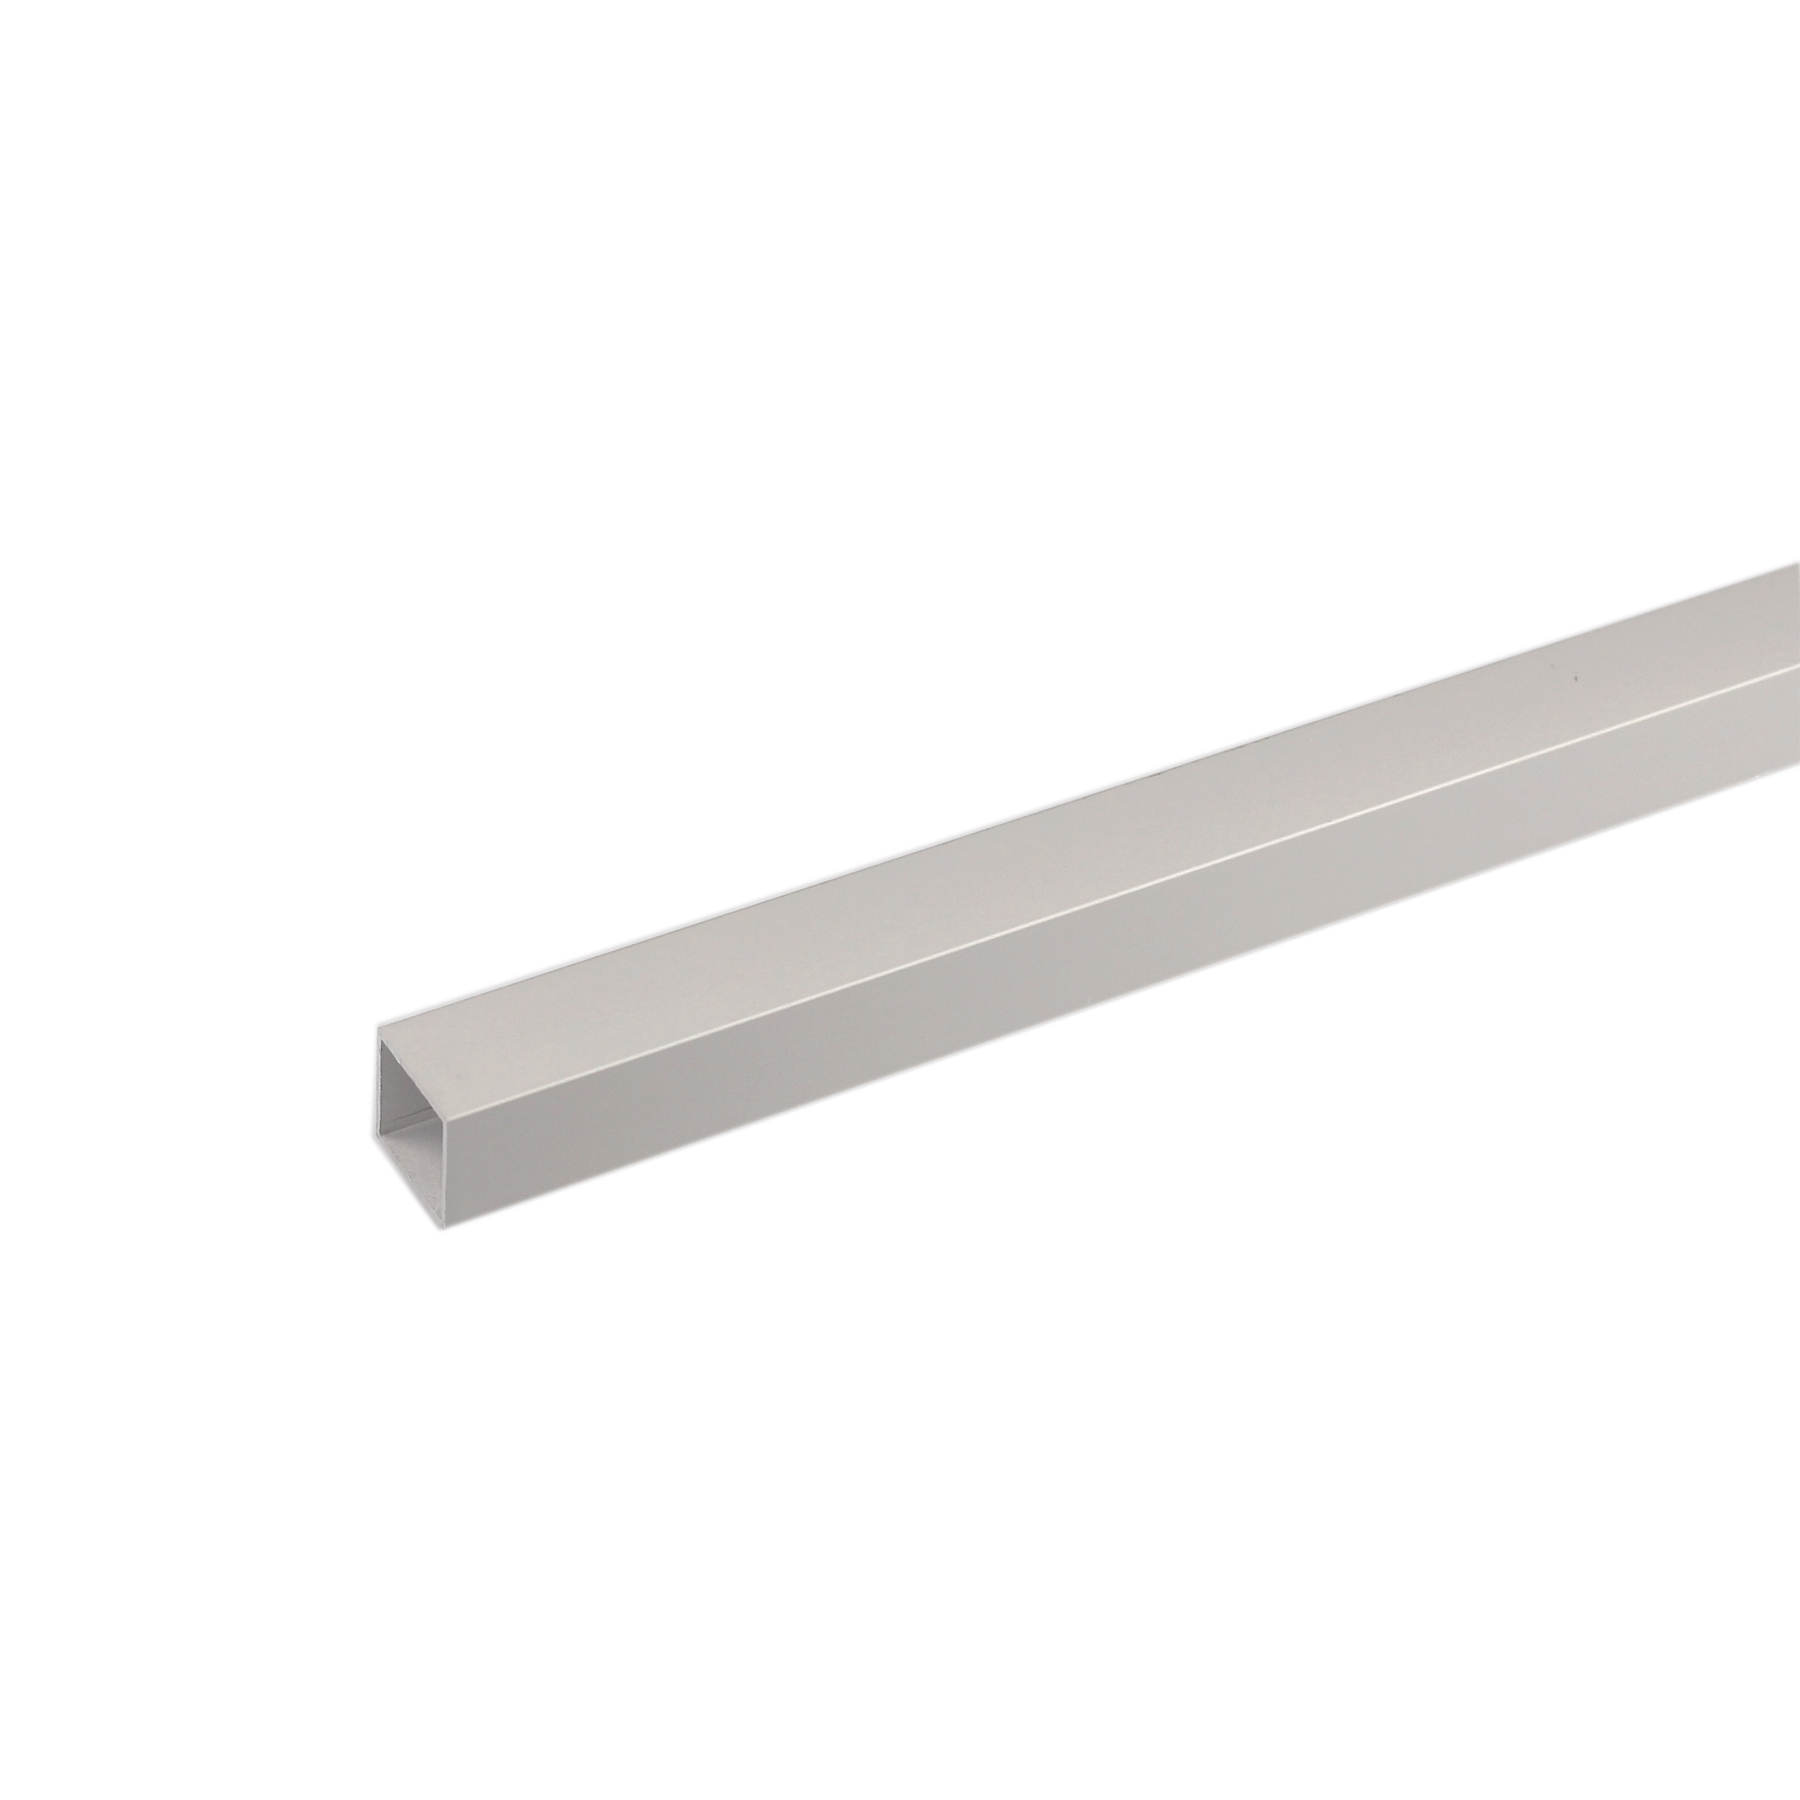 Perfil alum nio tubo quadrado 2mx10x10mm anodizado leroy for Perfil u aluminio leroy merlin